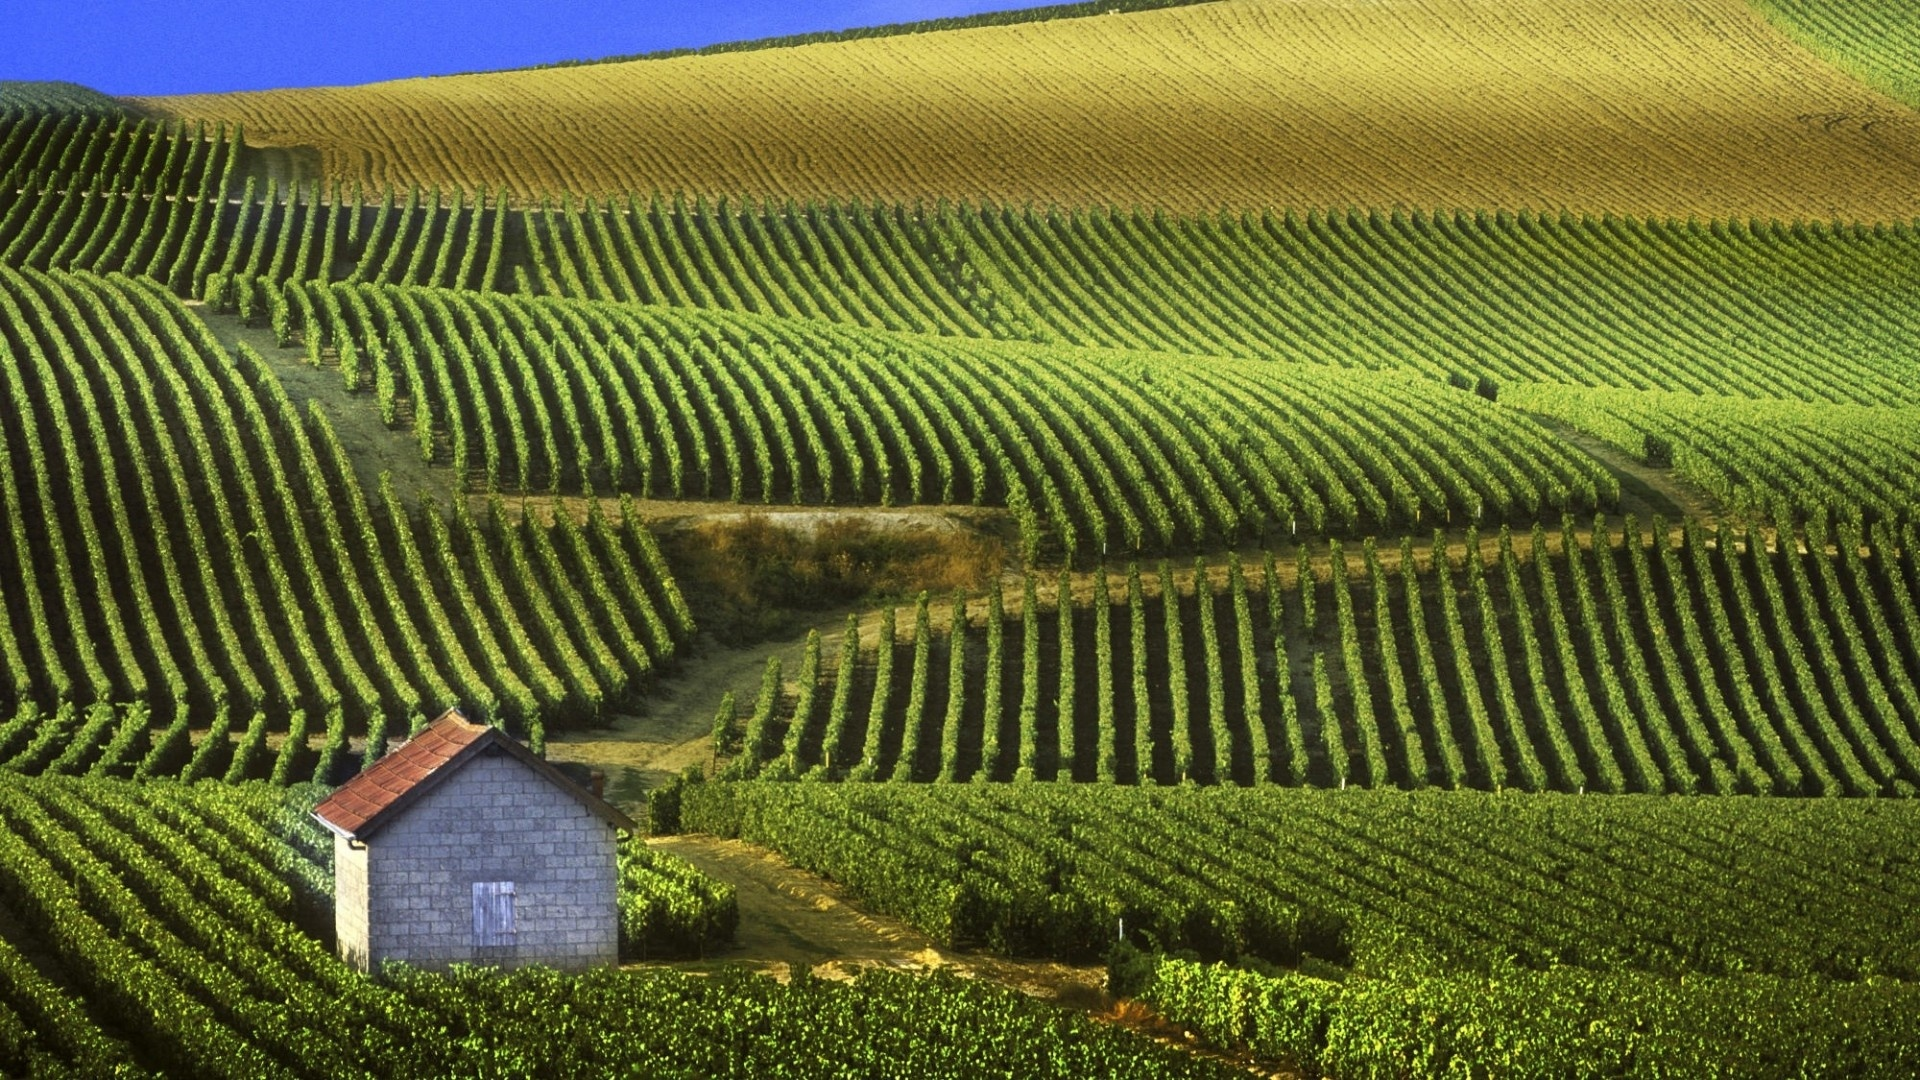 Vineyard cool wallpaper